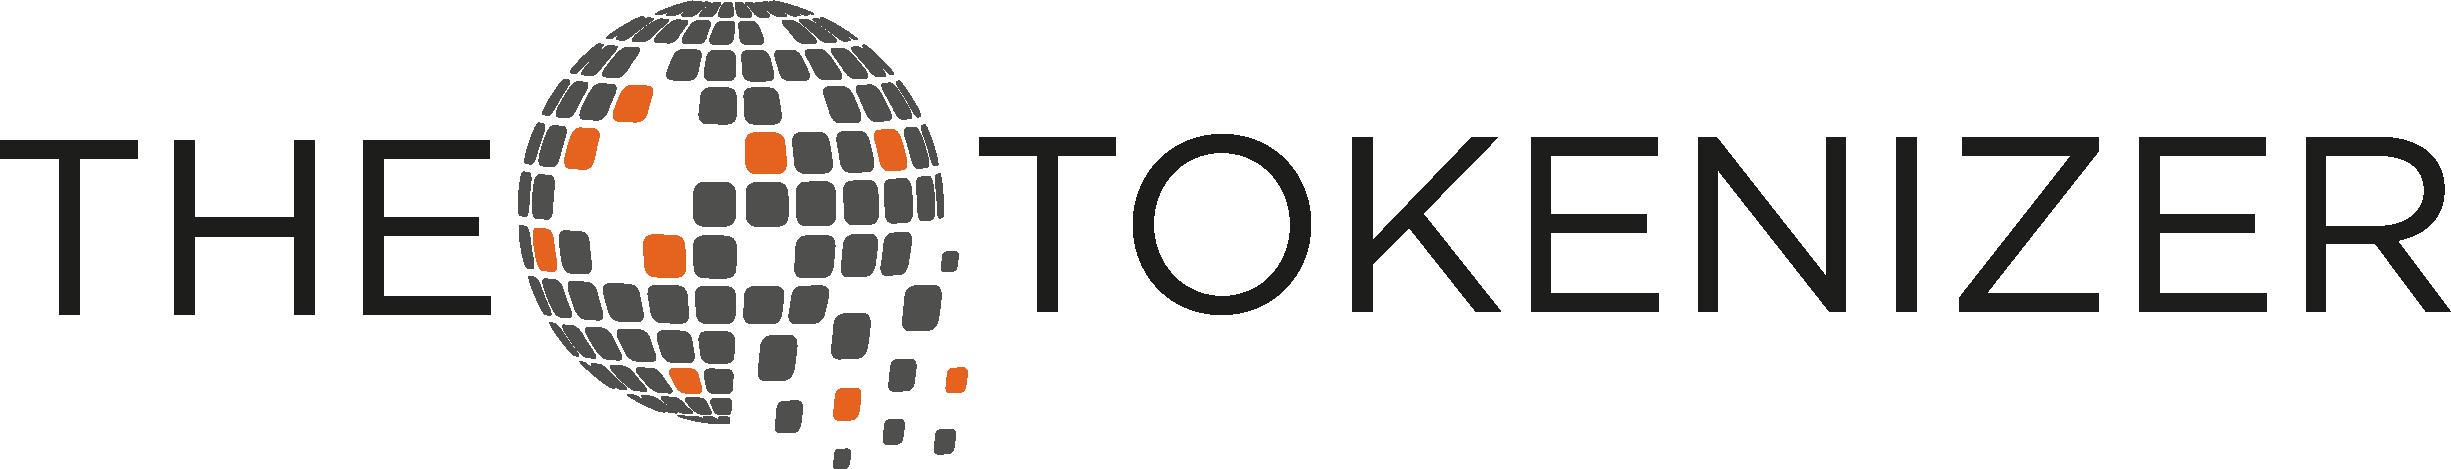 Norfico/The Tokenizer Logo